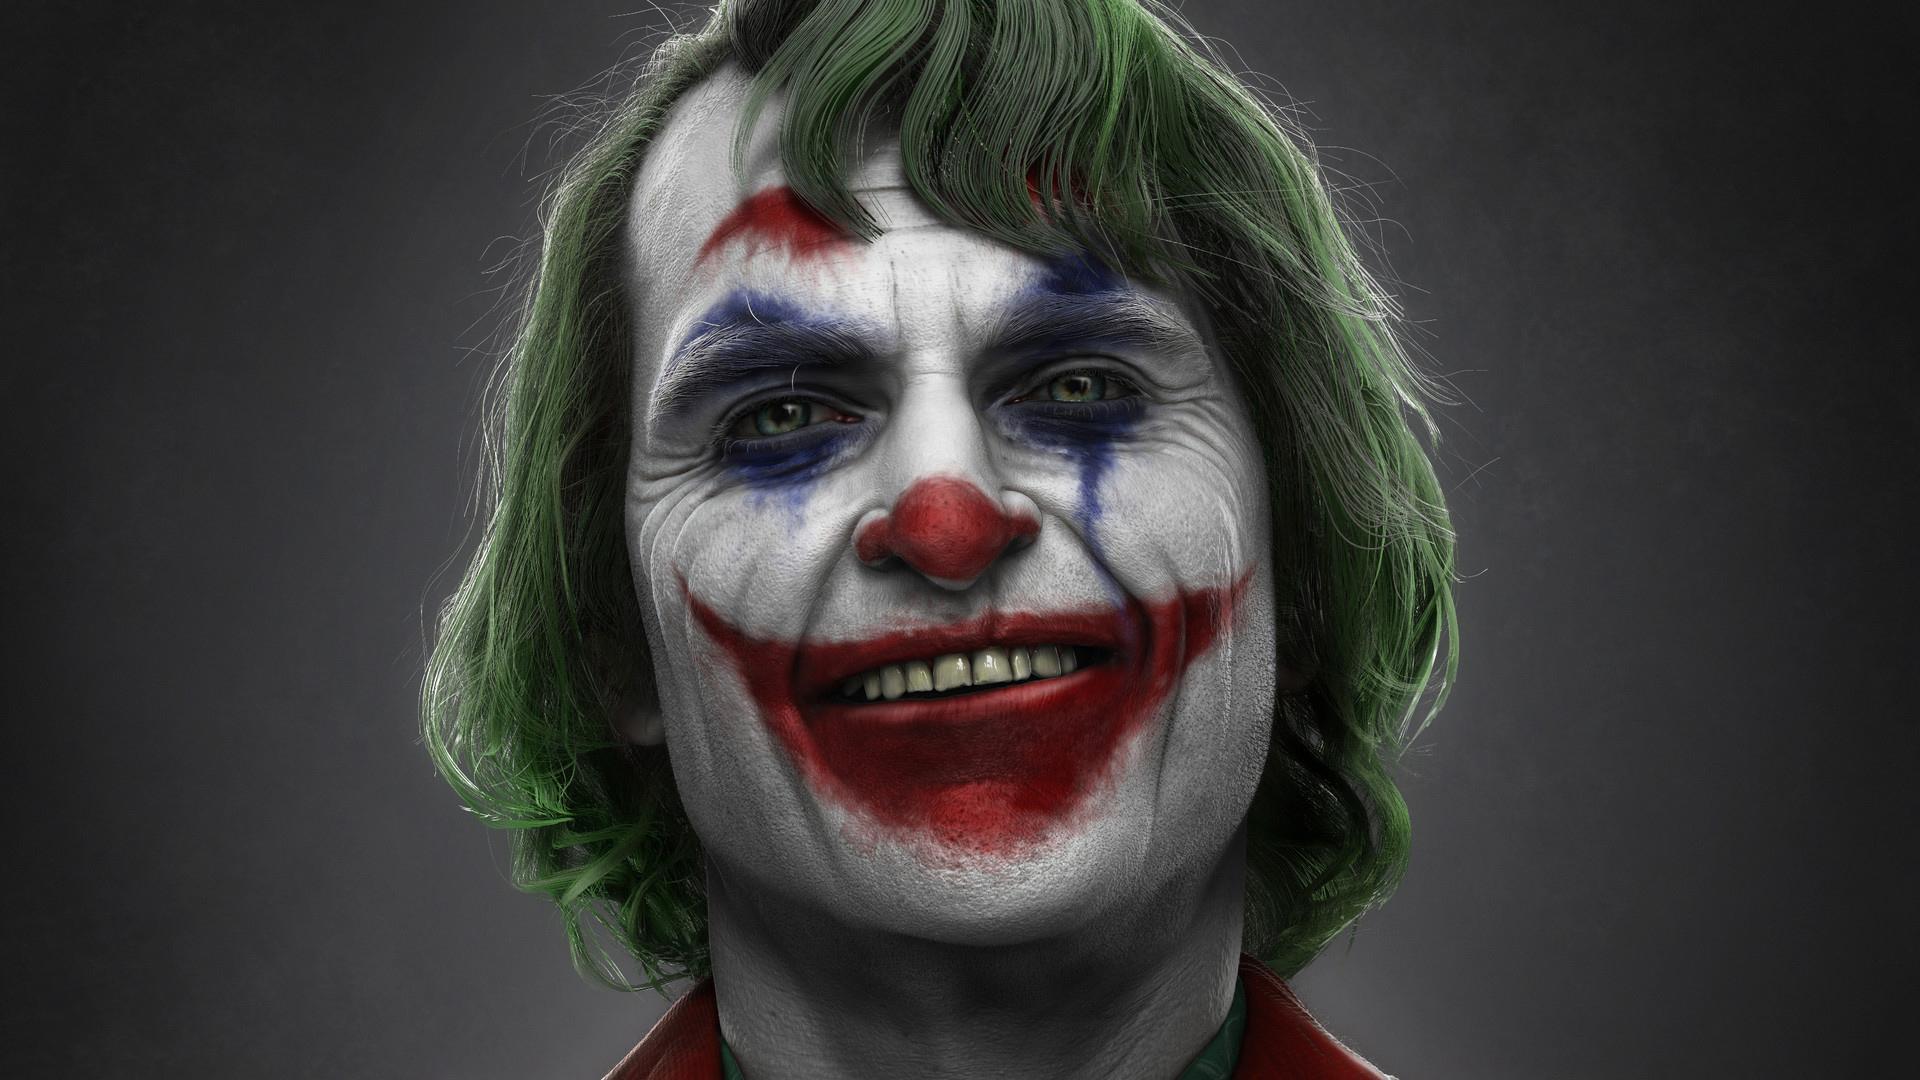 Ipad Joker Wallpaper